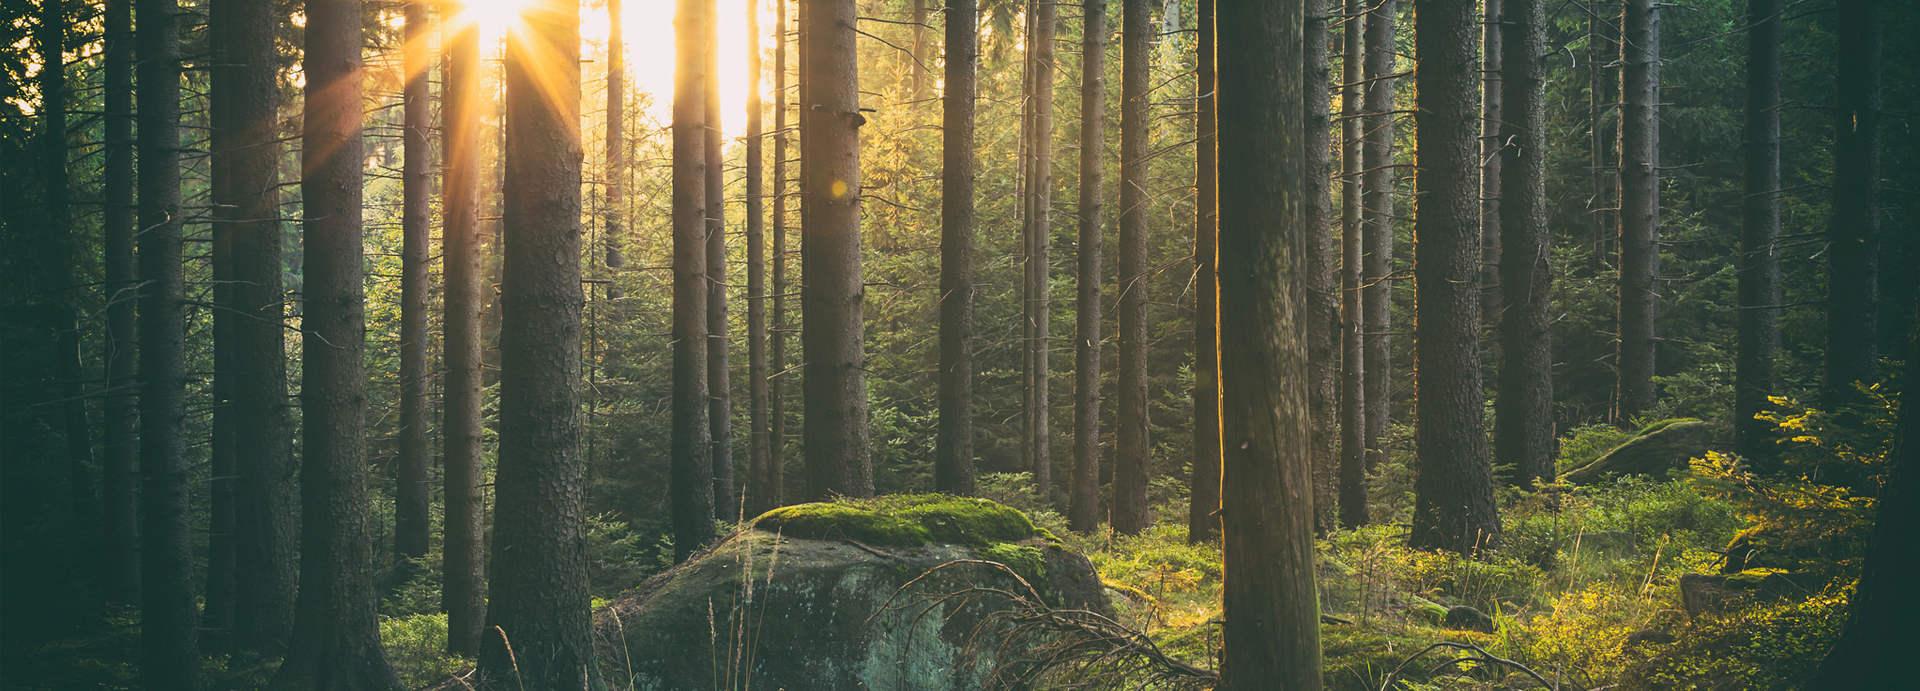 طبیعت جنگل - ایران